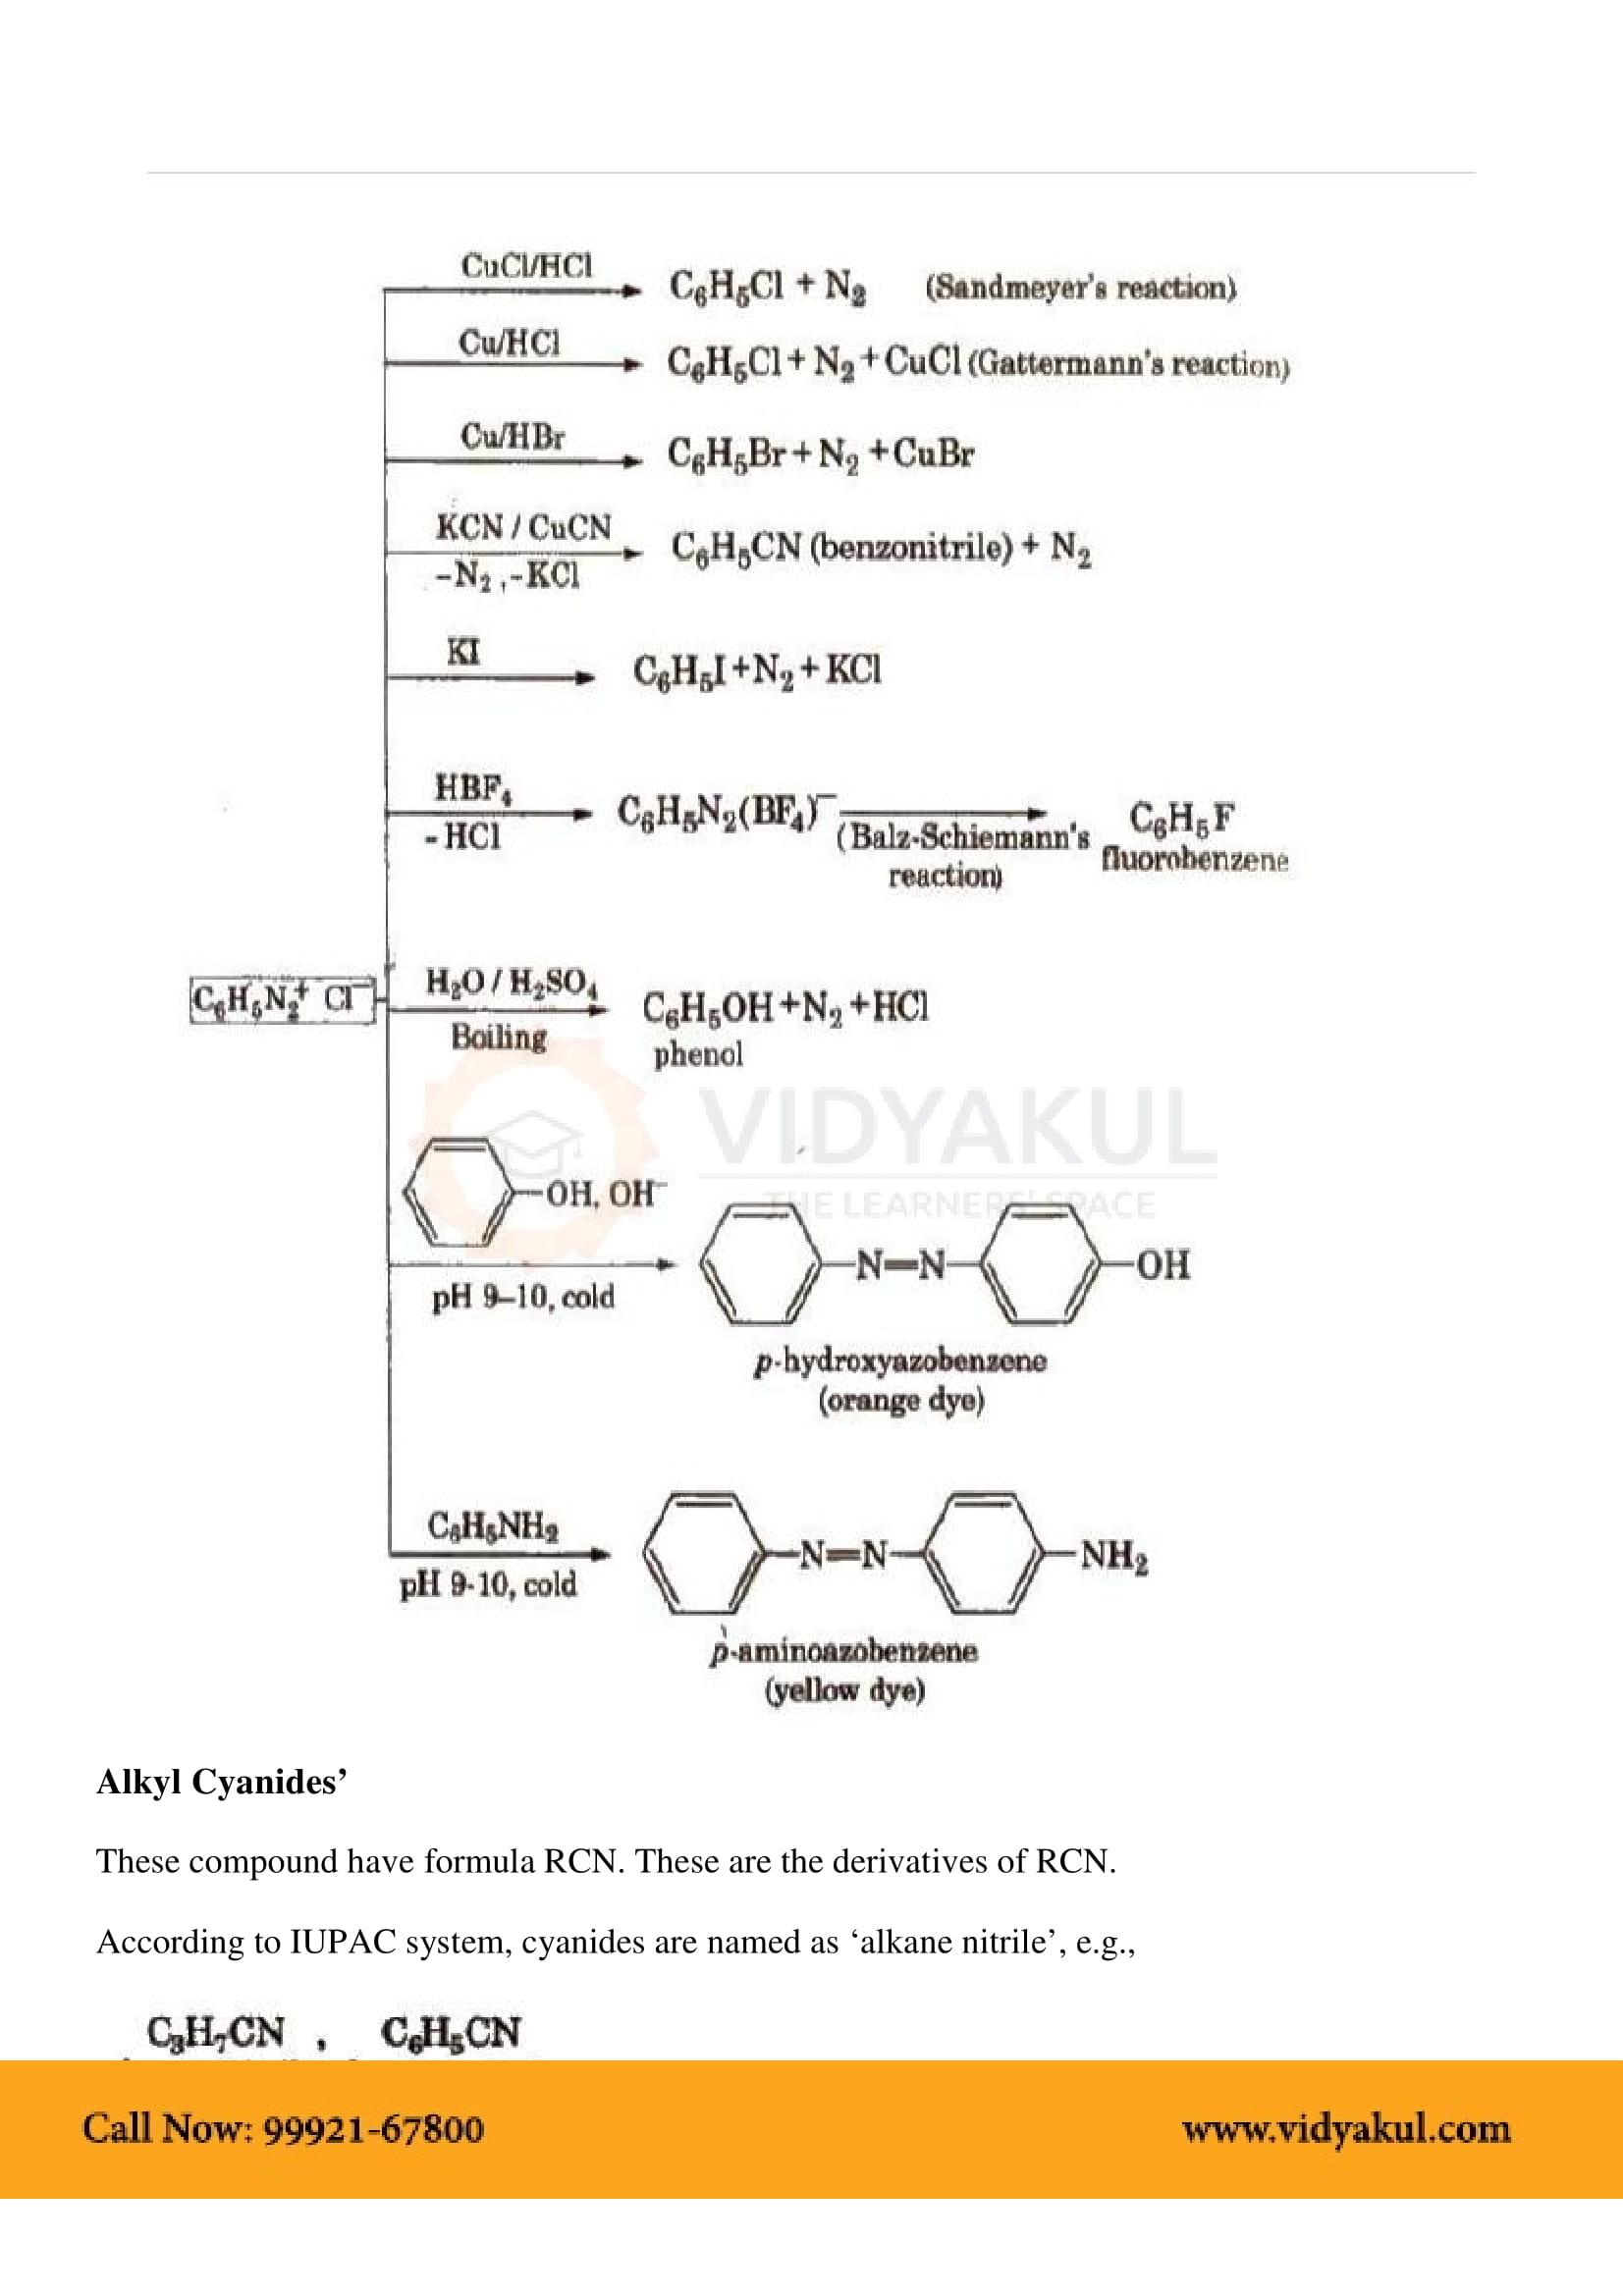 Organic Compounds Containing Nitrogen Class 12 Notes | Vidyakul